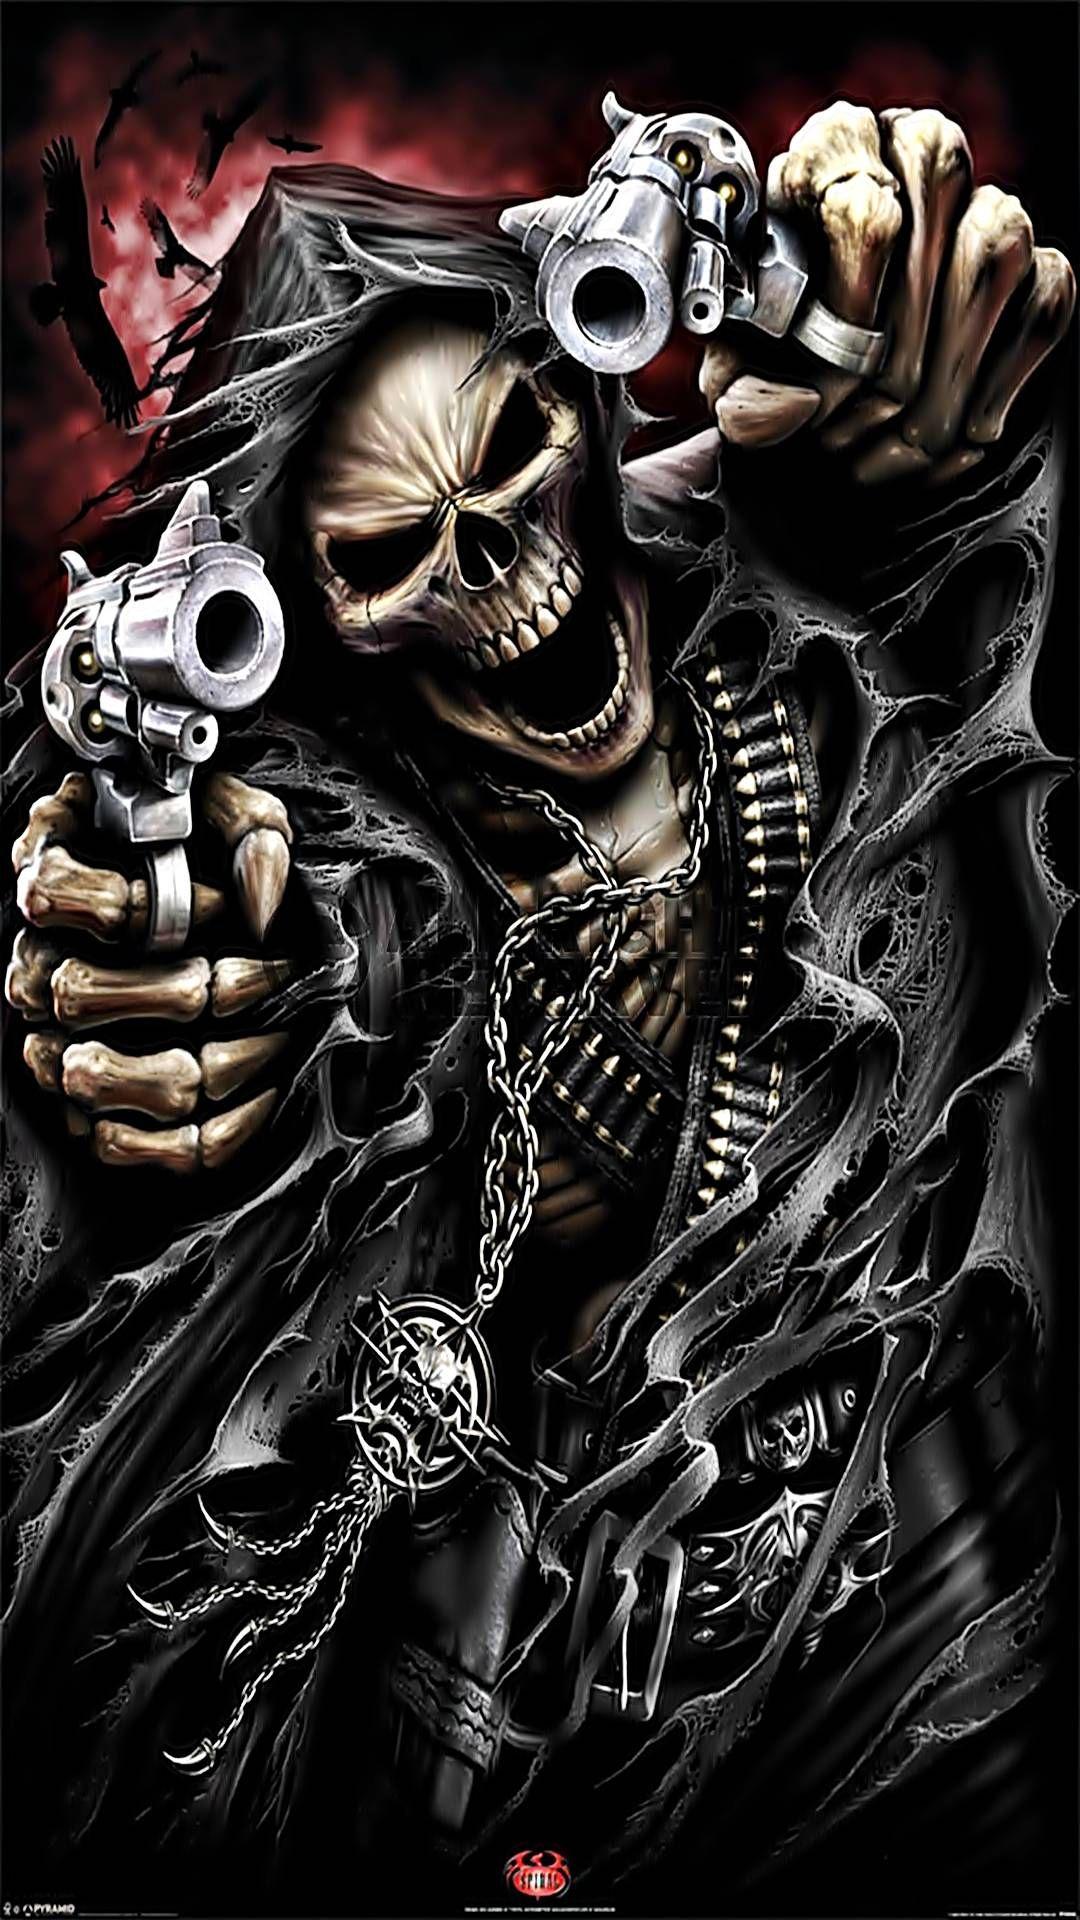 Skull Mobile Hd Wallpaper Skull Wallpaper Ghost Rider Wallpaper Grim Reaper Art